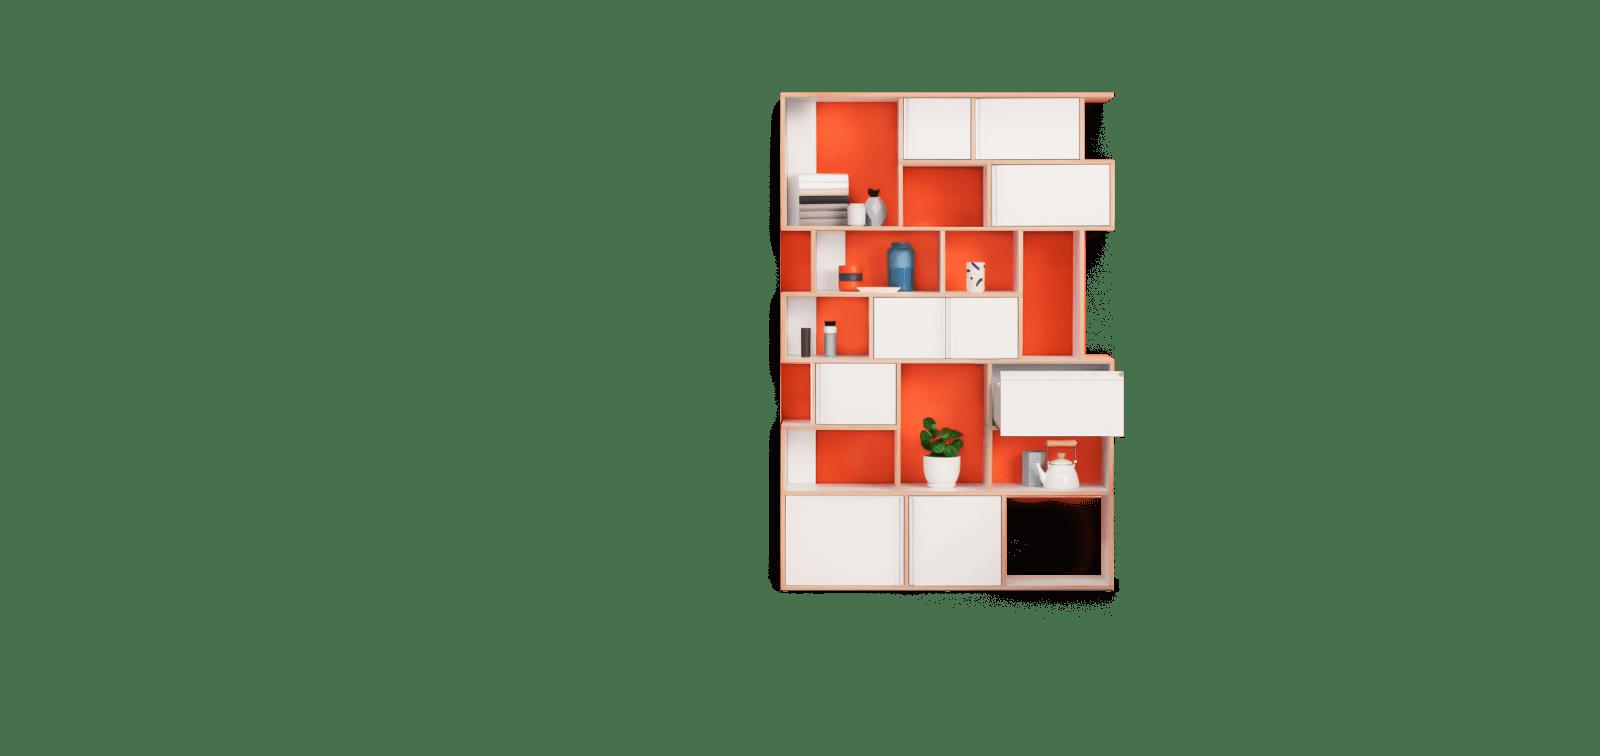 Furniture clipart bookshelf. Tylko the perfect shelf